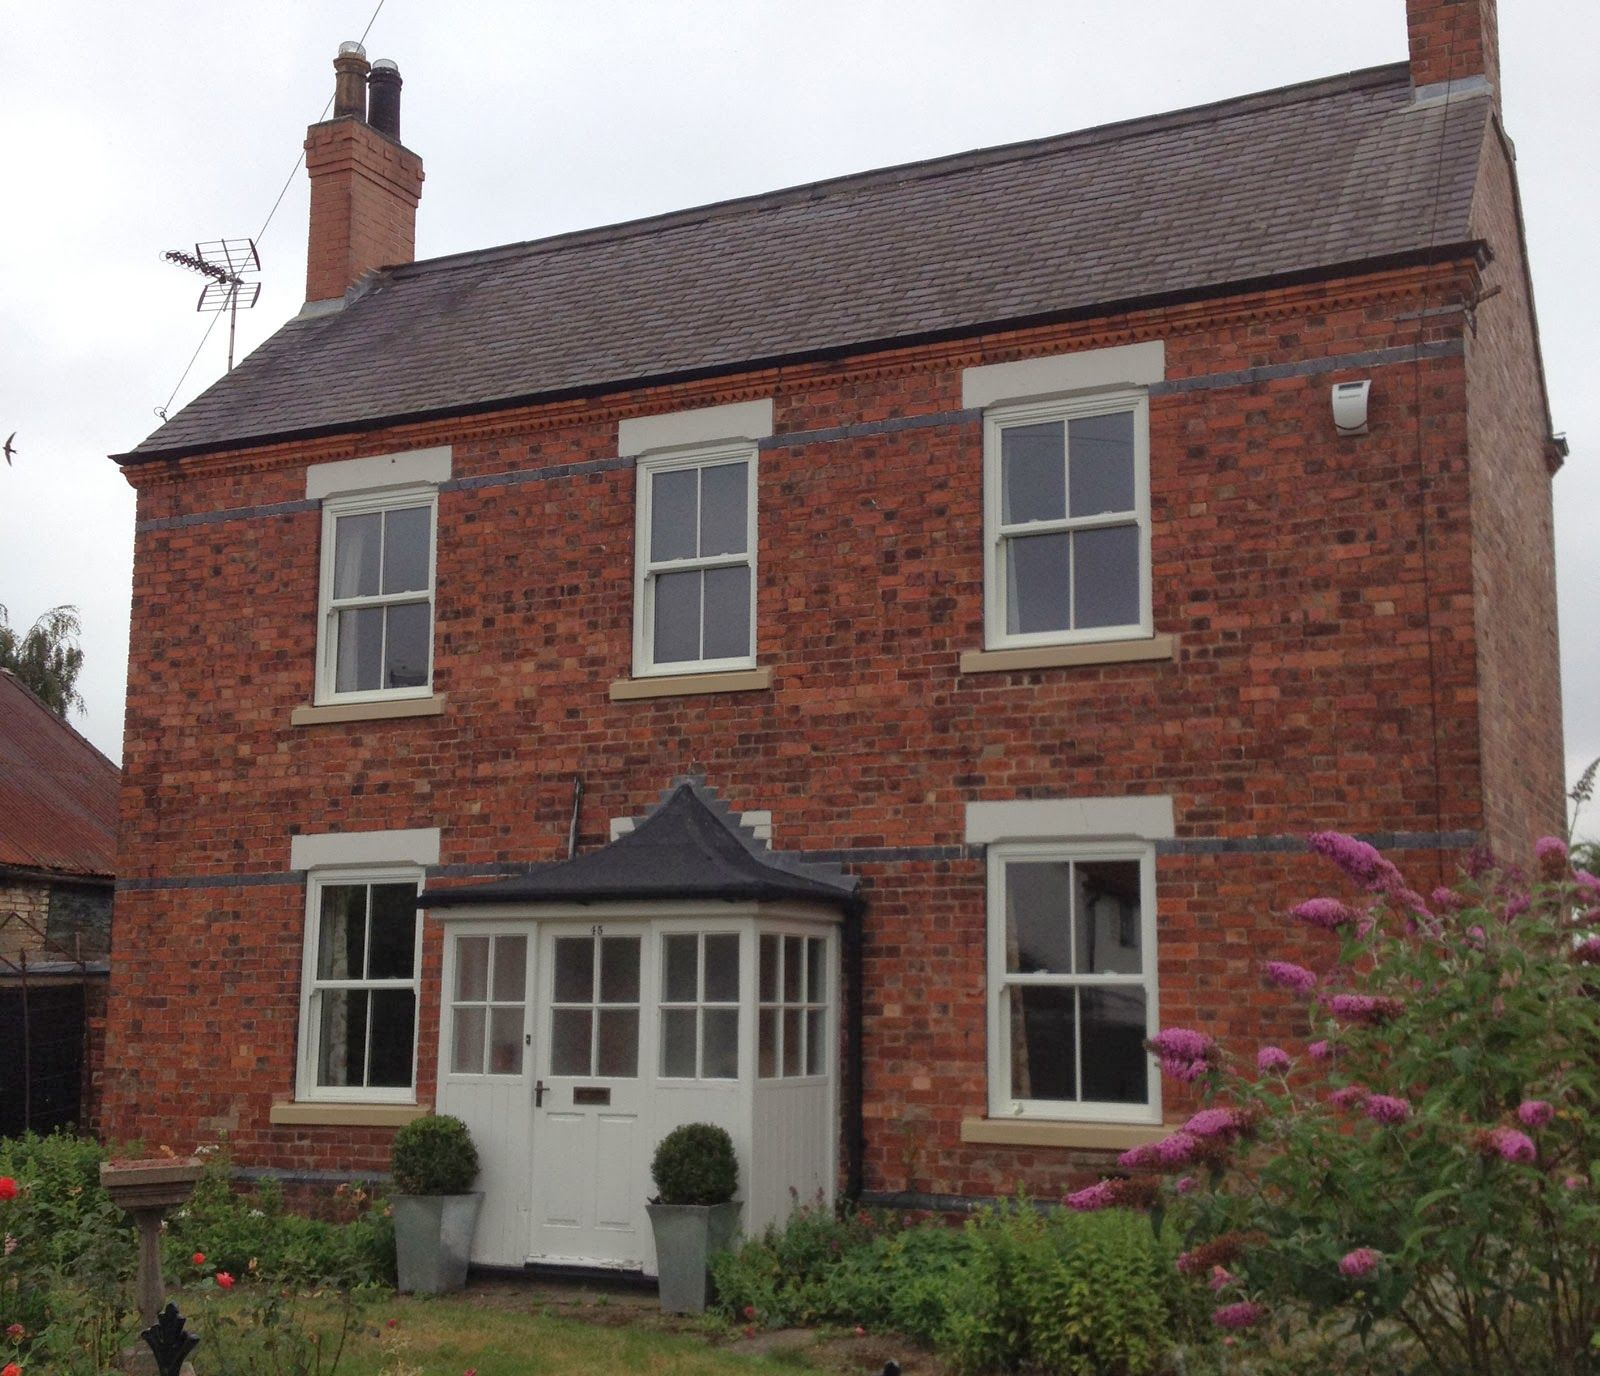 Cream Windows On Red Brick House Ireland Google Search Red Brick House Exterior Brick Exterior House Red Brick House